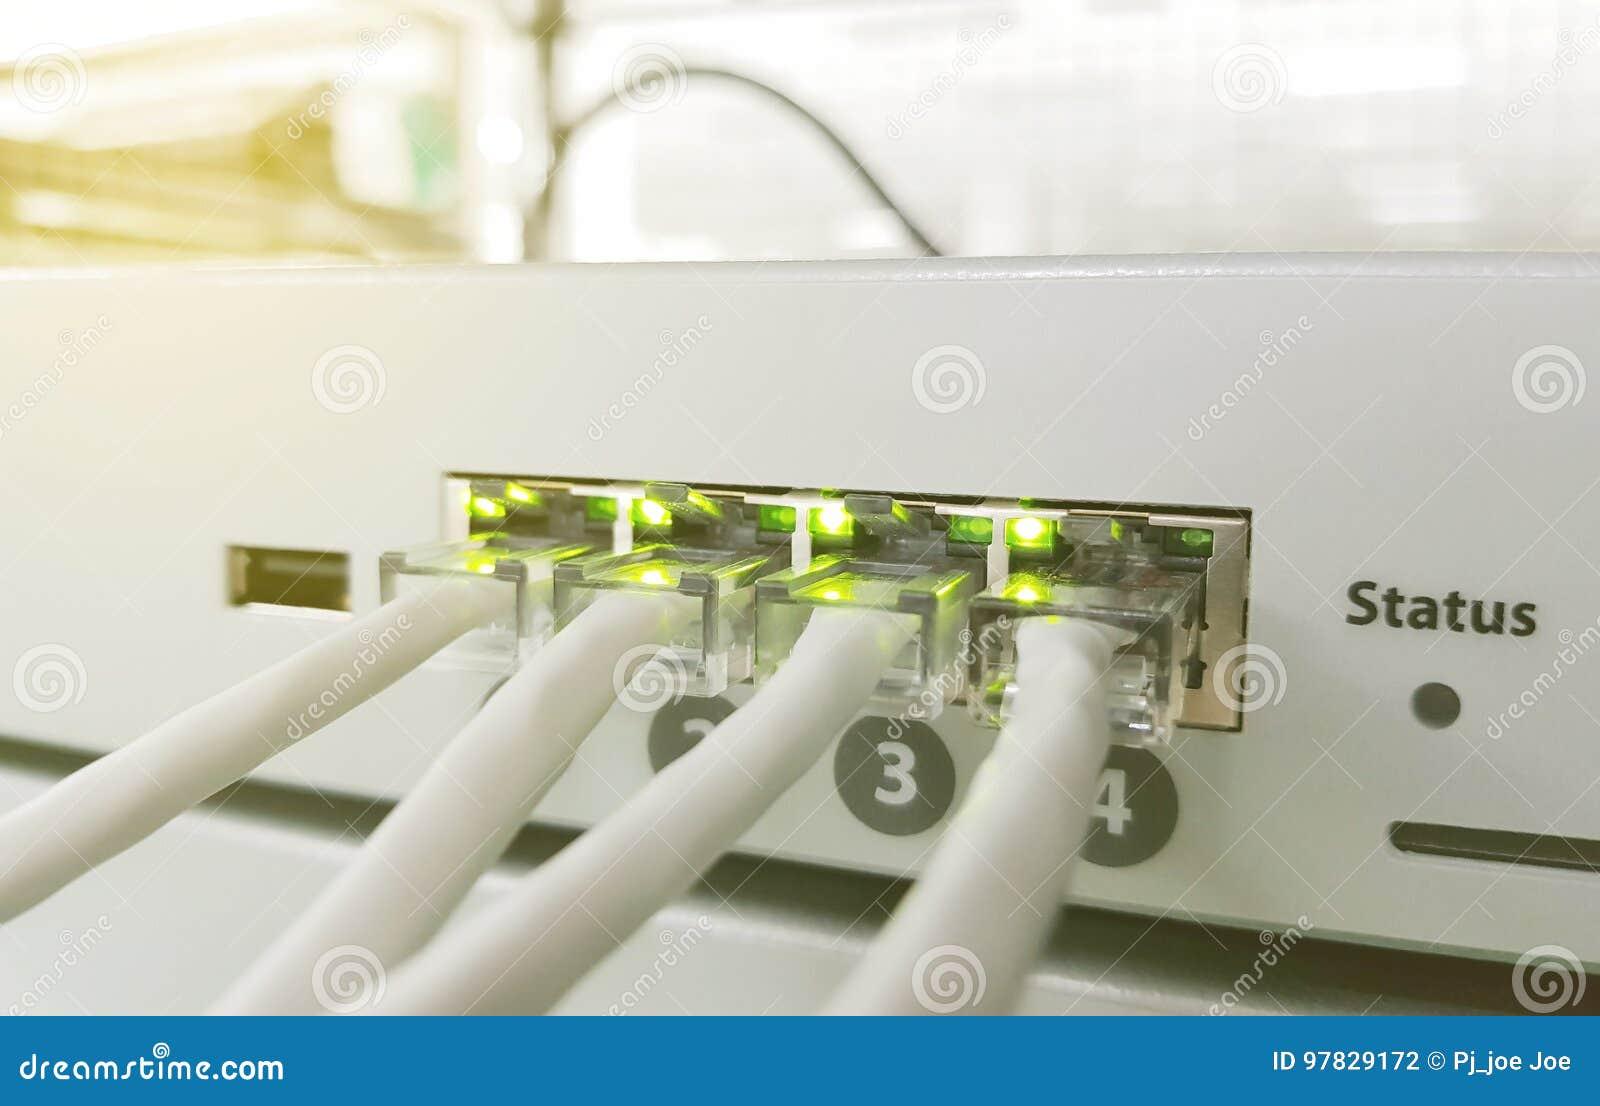 Netzplatte, Schalter